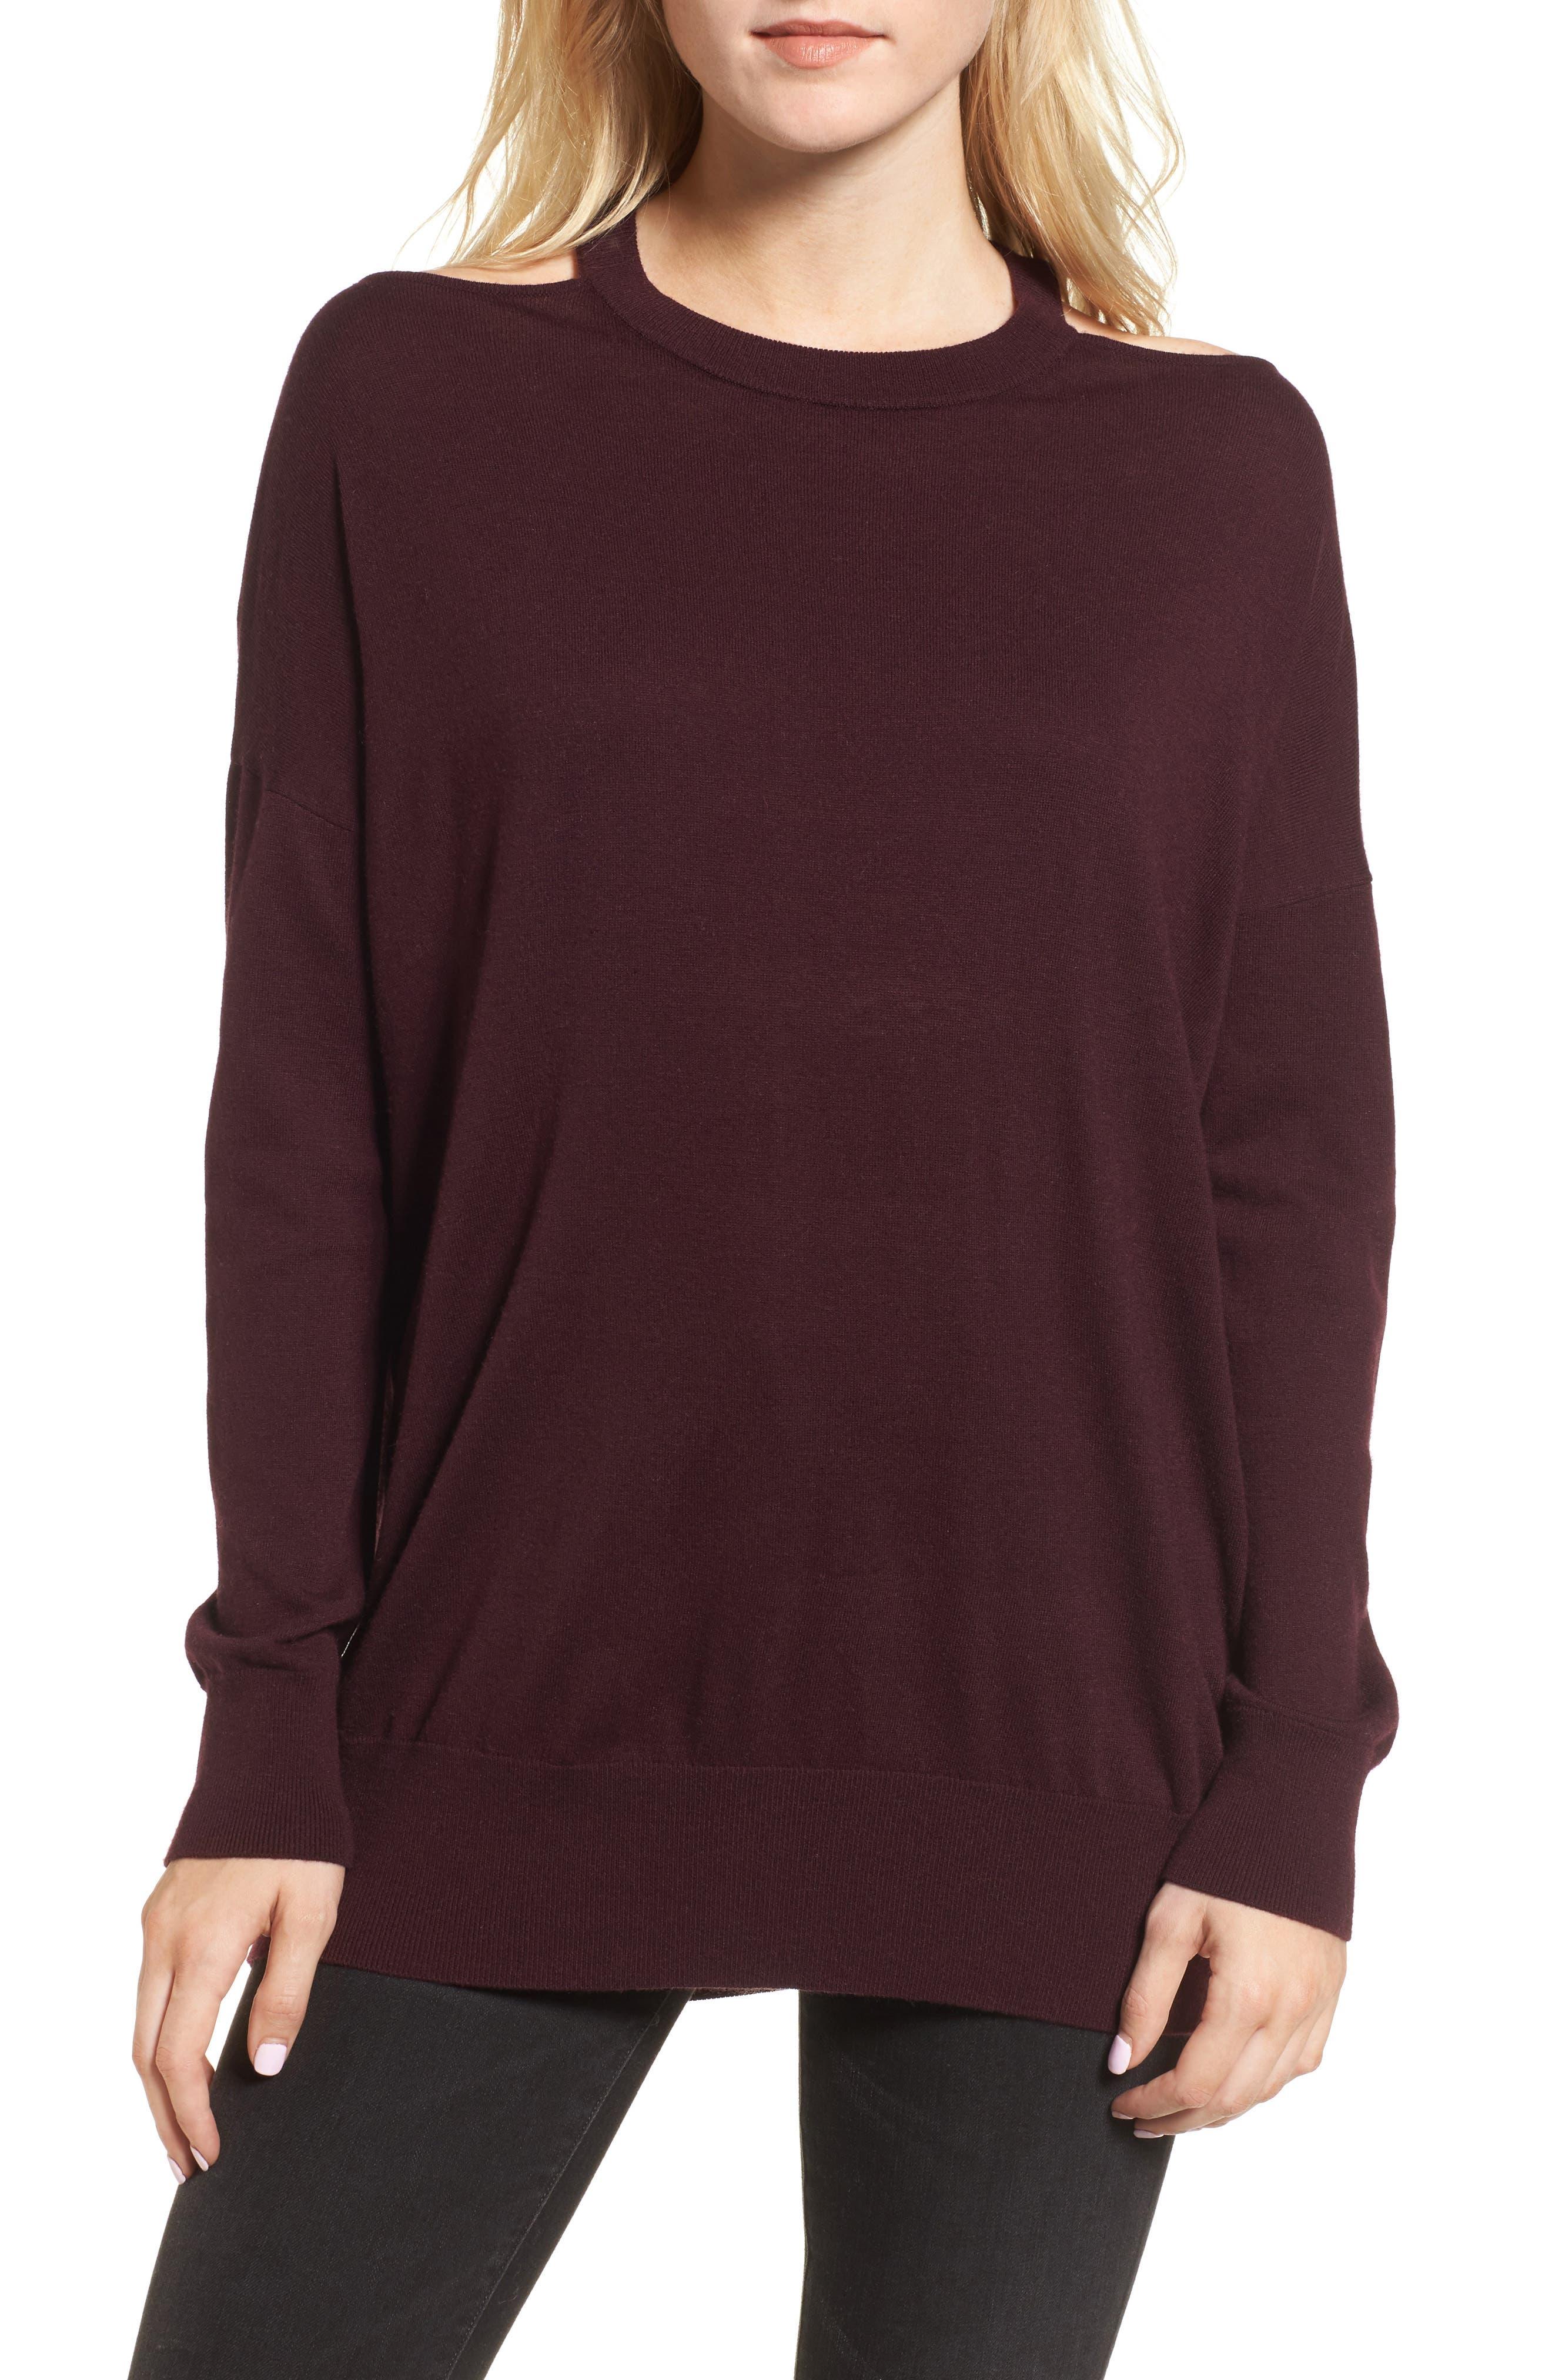 Splendid Canarise Cutout Sweater